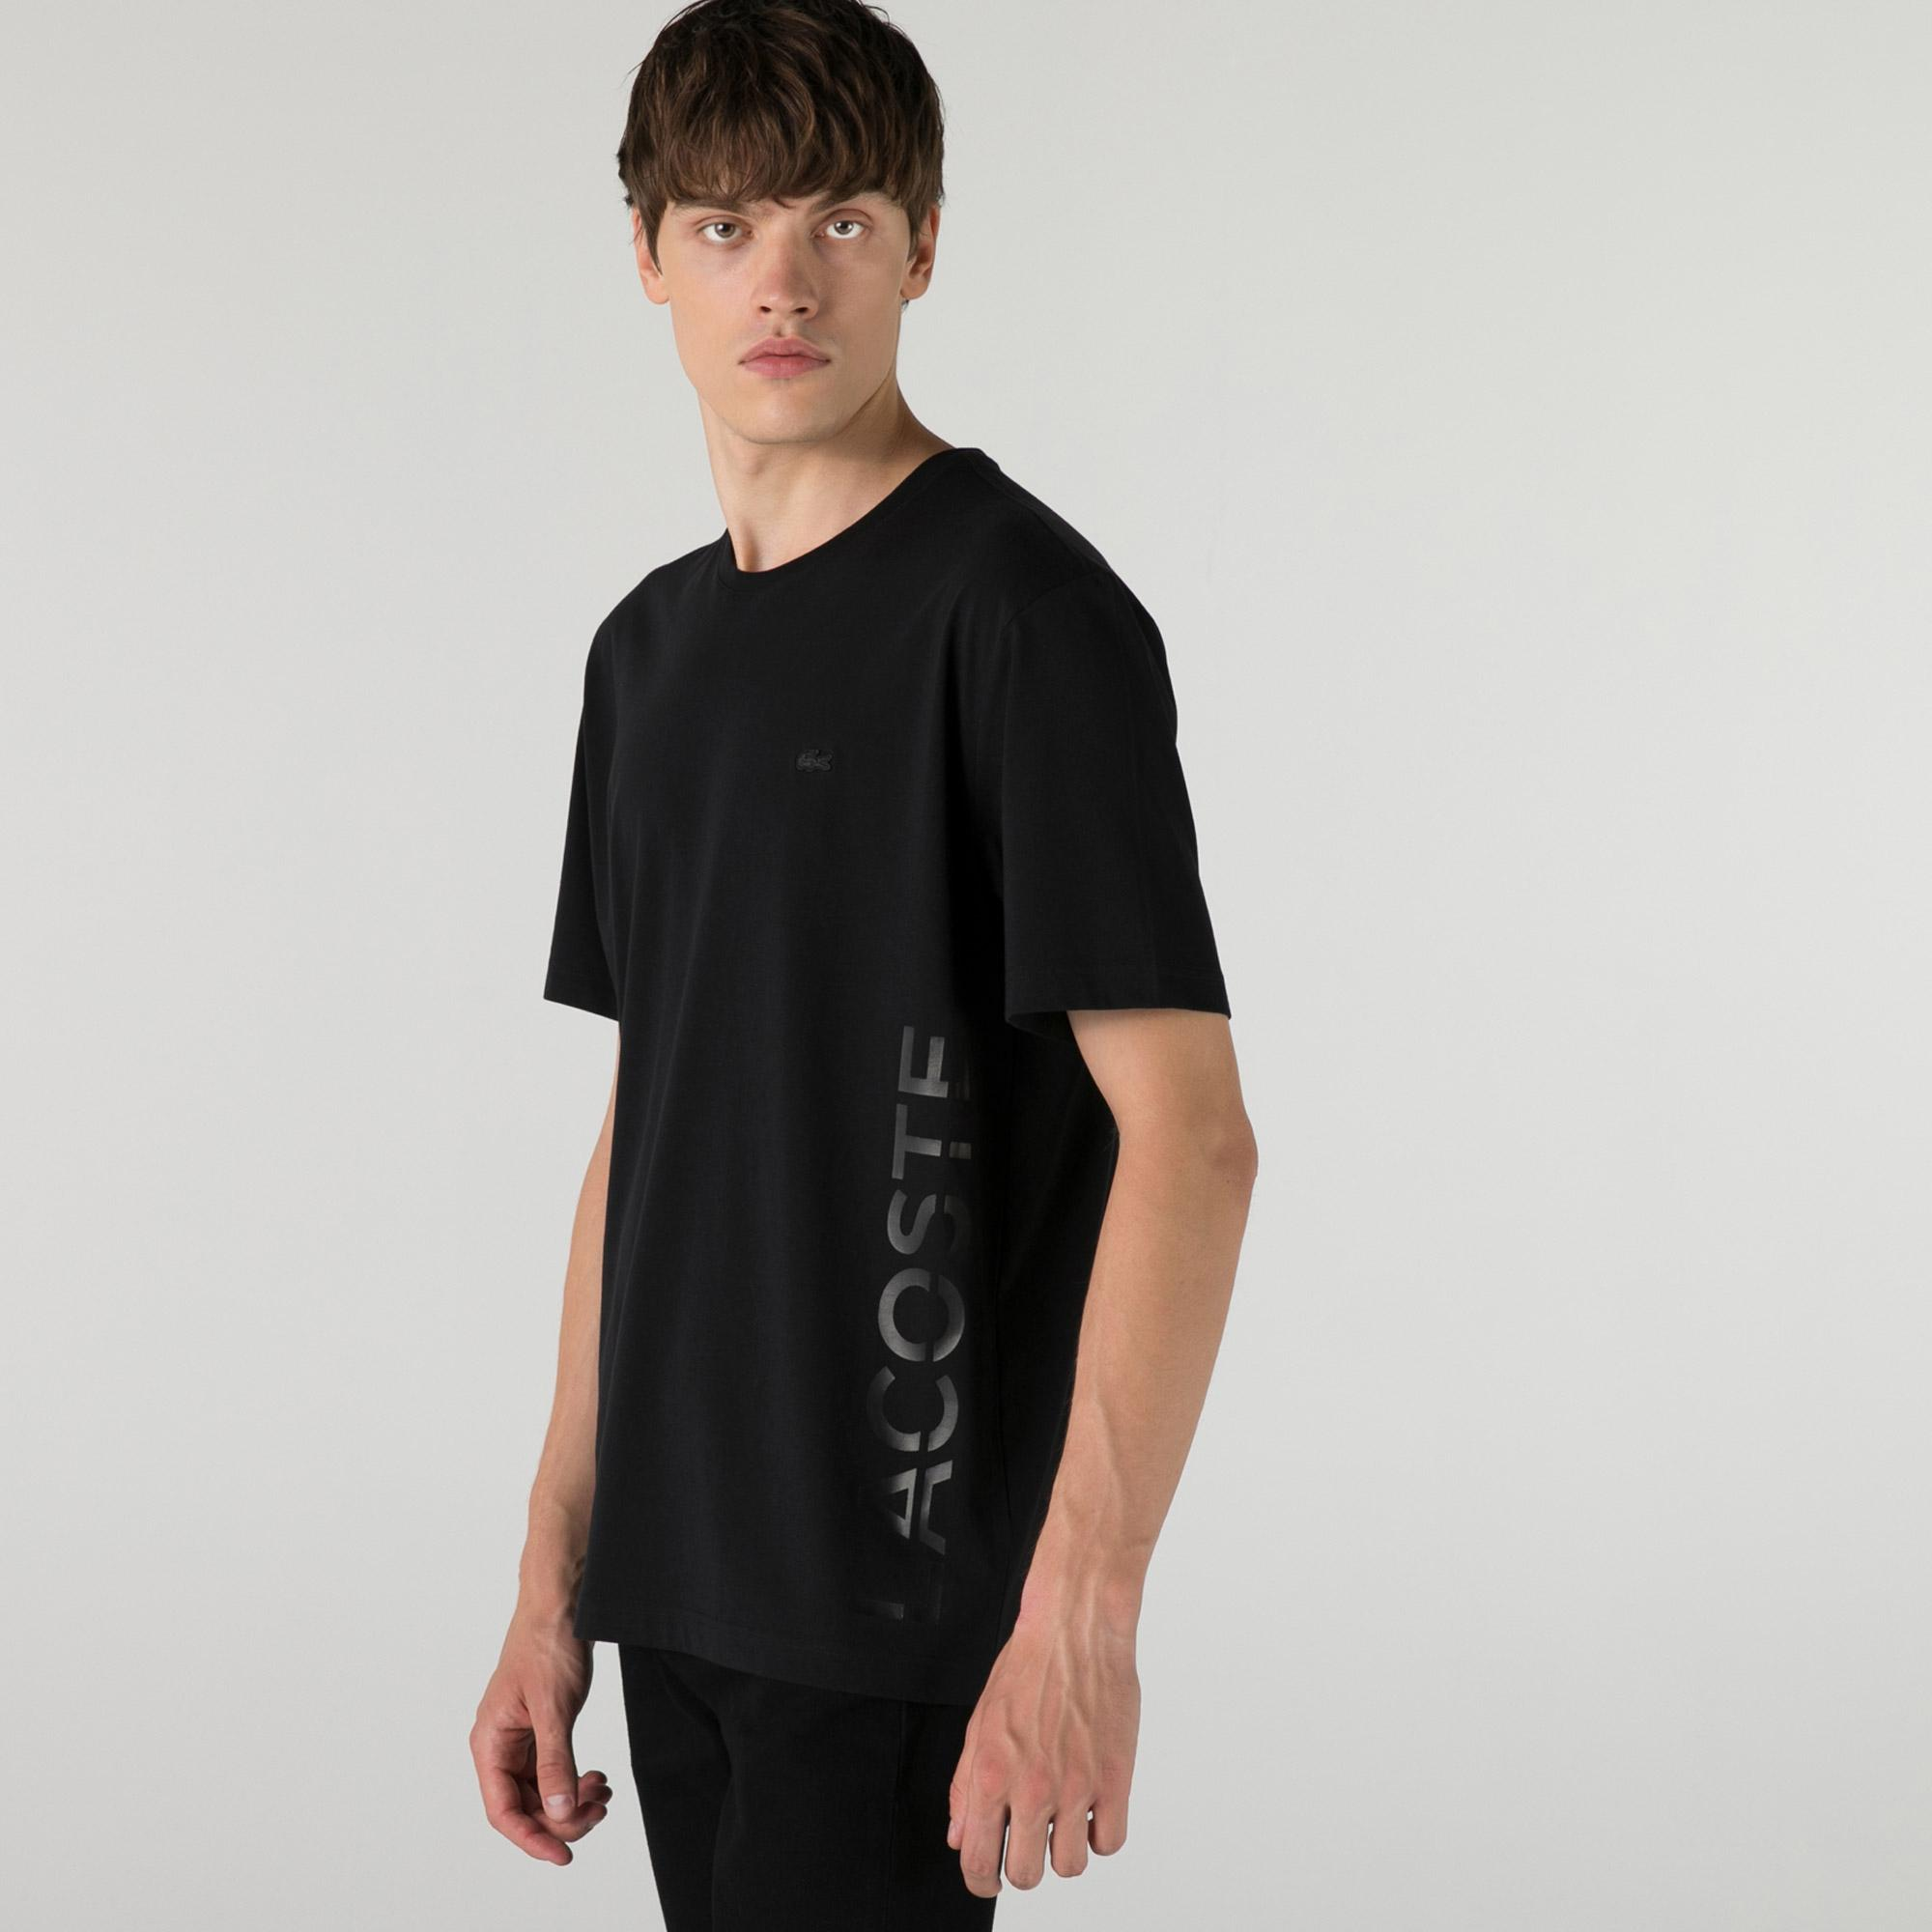 Lacoste Erkek Relaxed Fit Bisiklet Yaka Baskılı Siyah T-Shirt